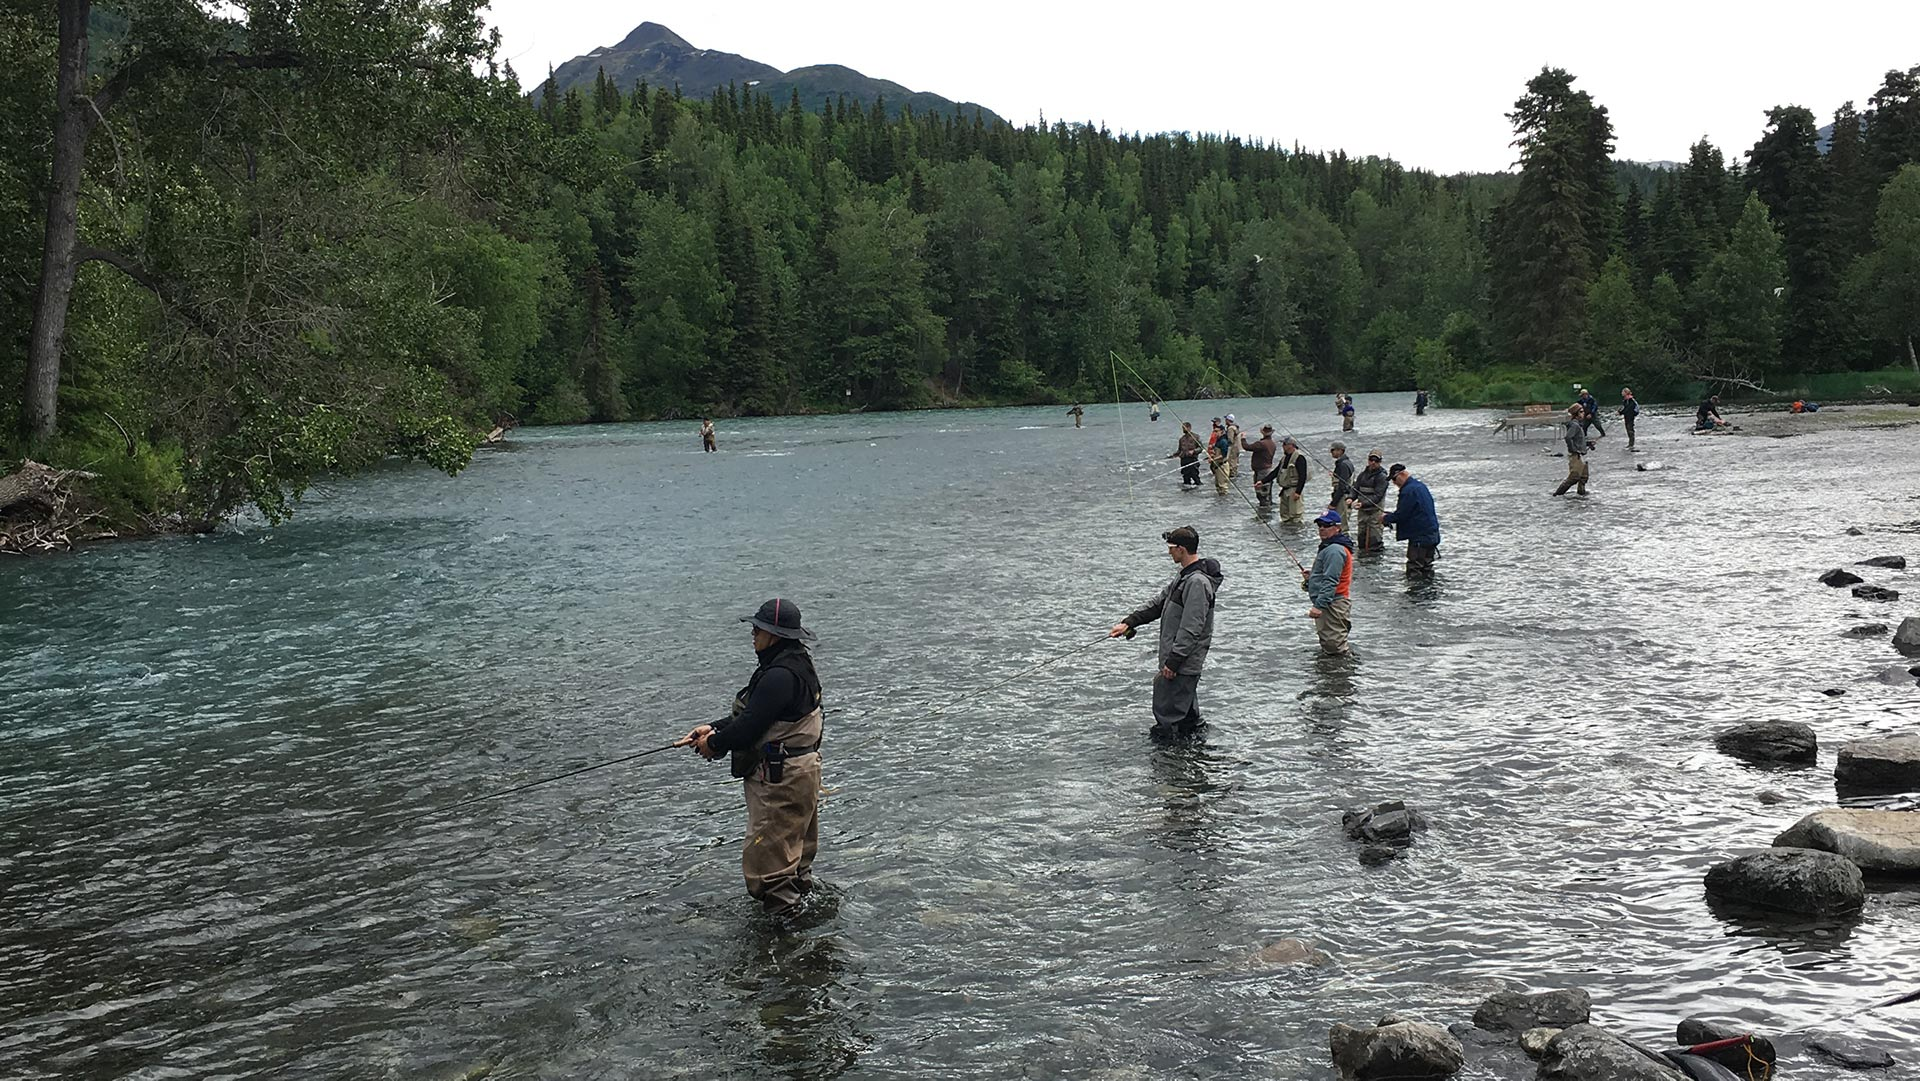 Kenai river fishing salmon and trout the river crew for Kenai river fishing